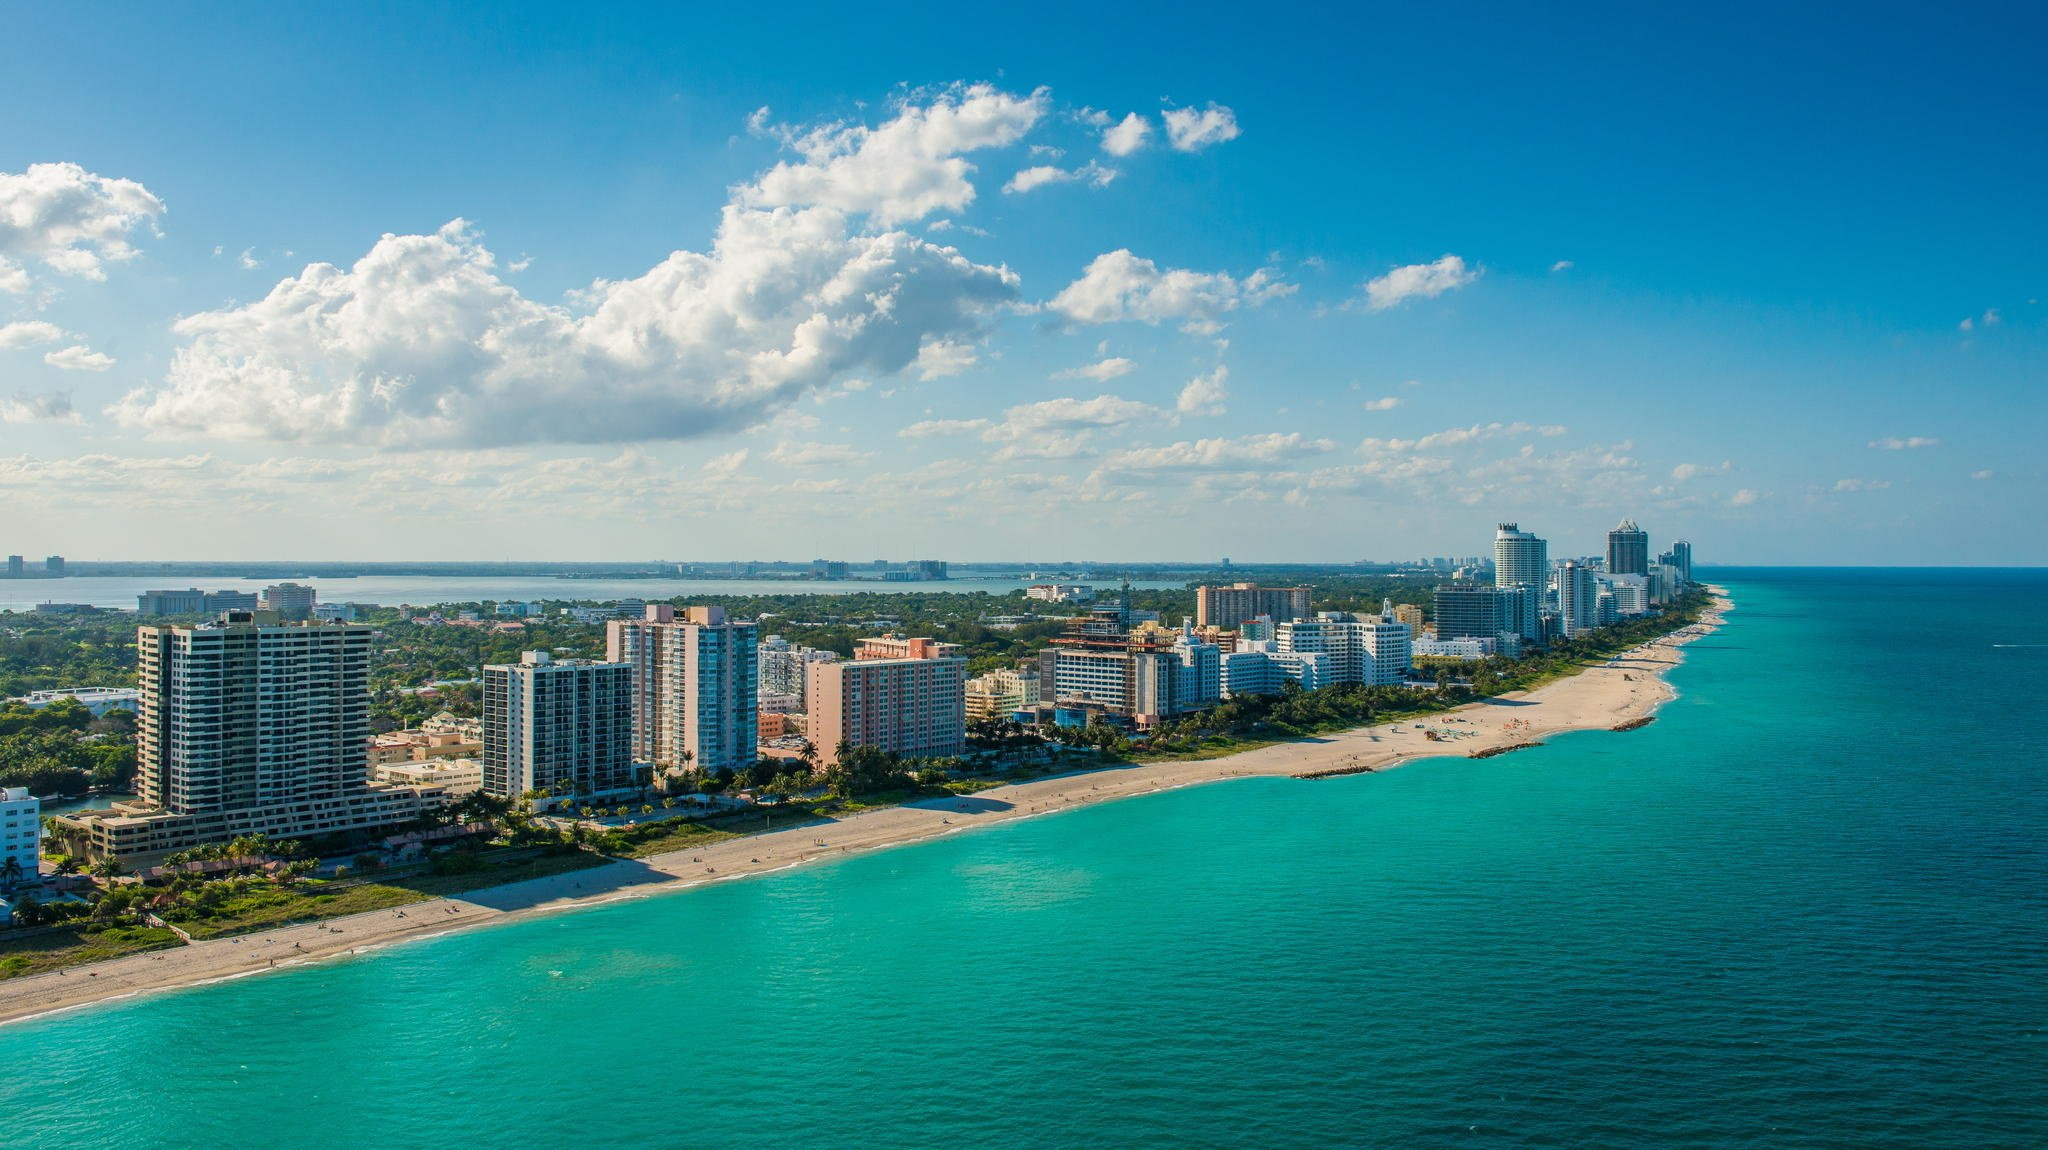 48 Miami Beach Desktop Wallpaper On Wallpapersafari